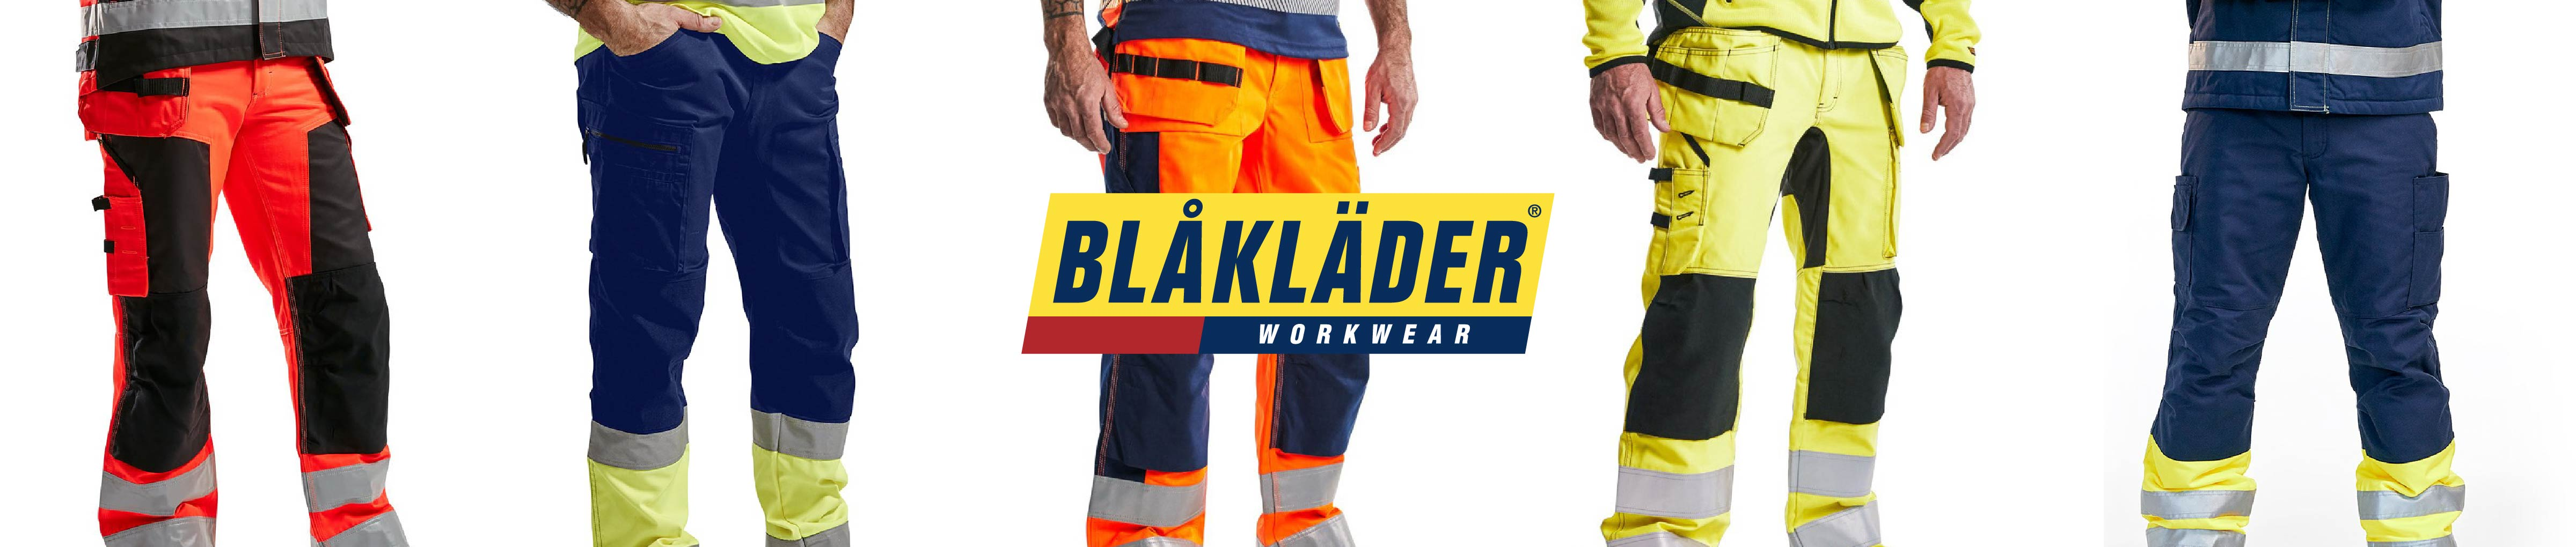 High vis work trousers